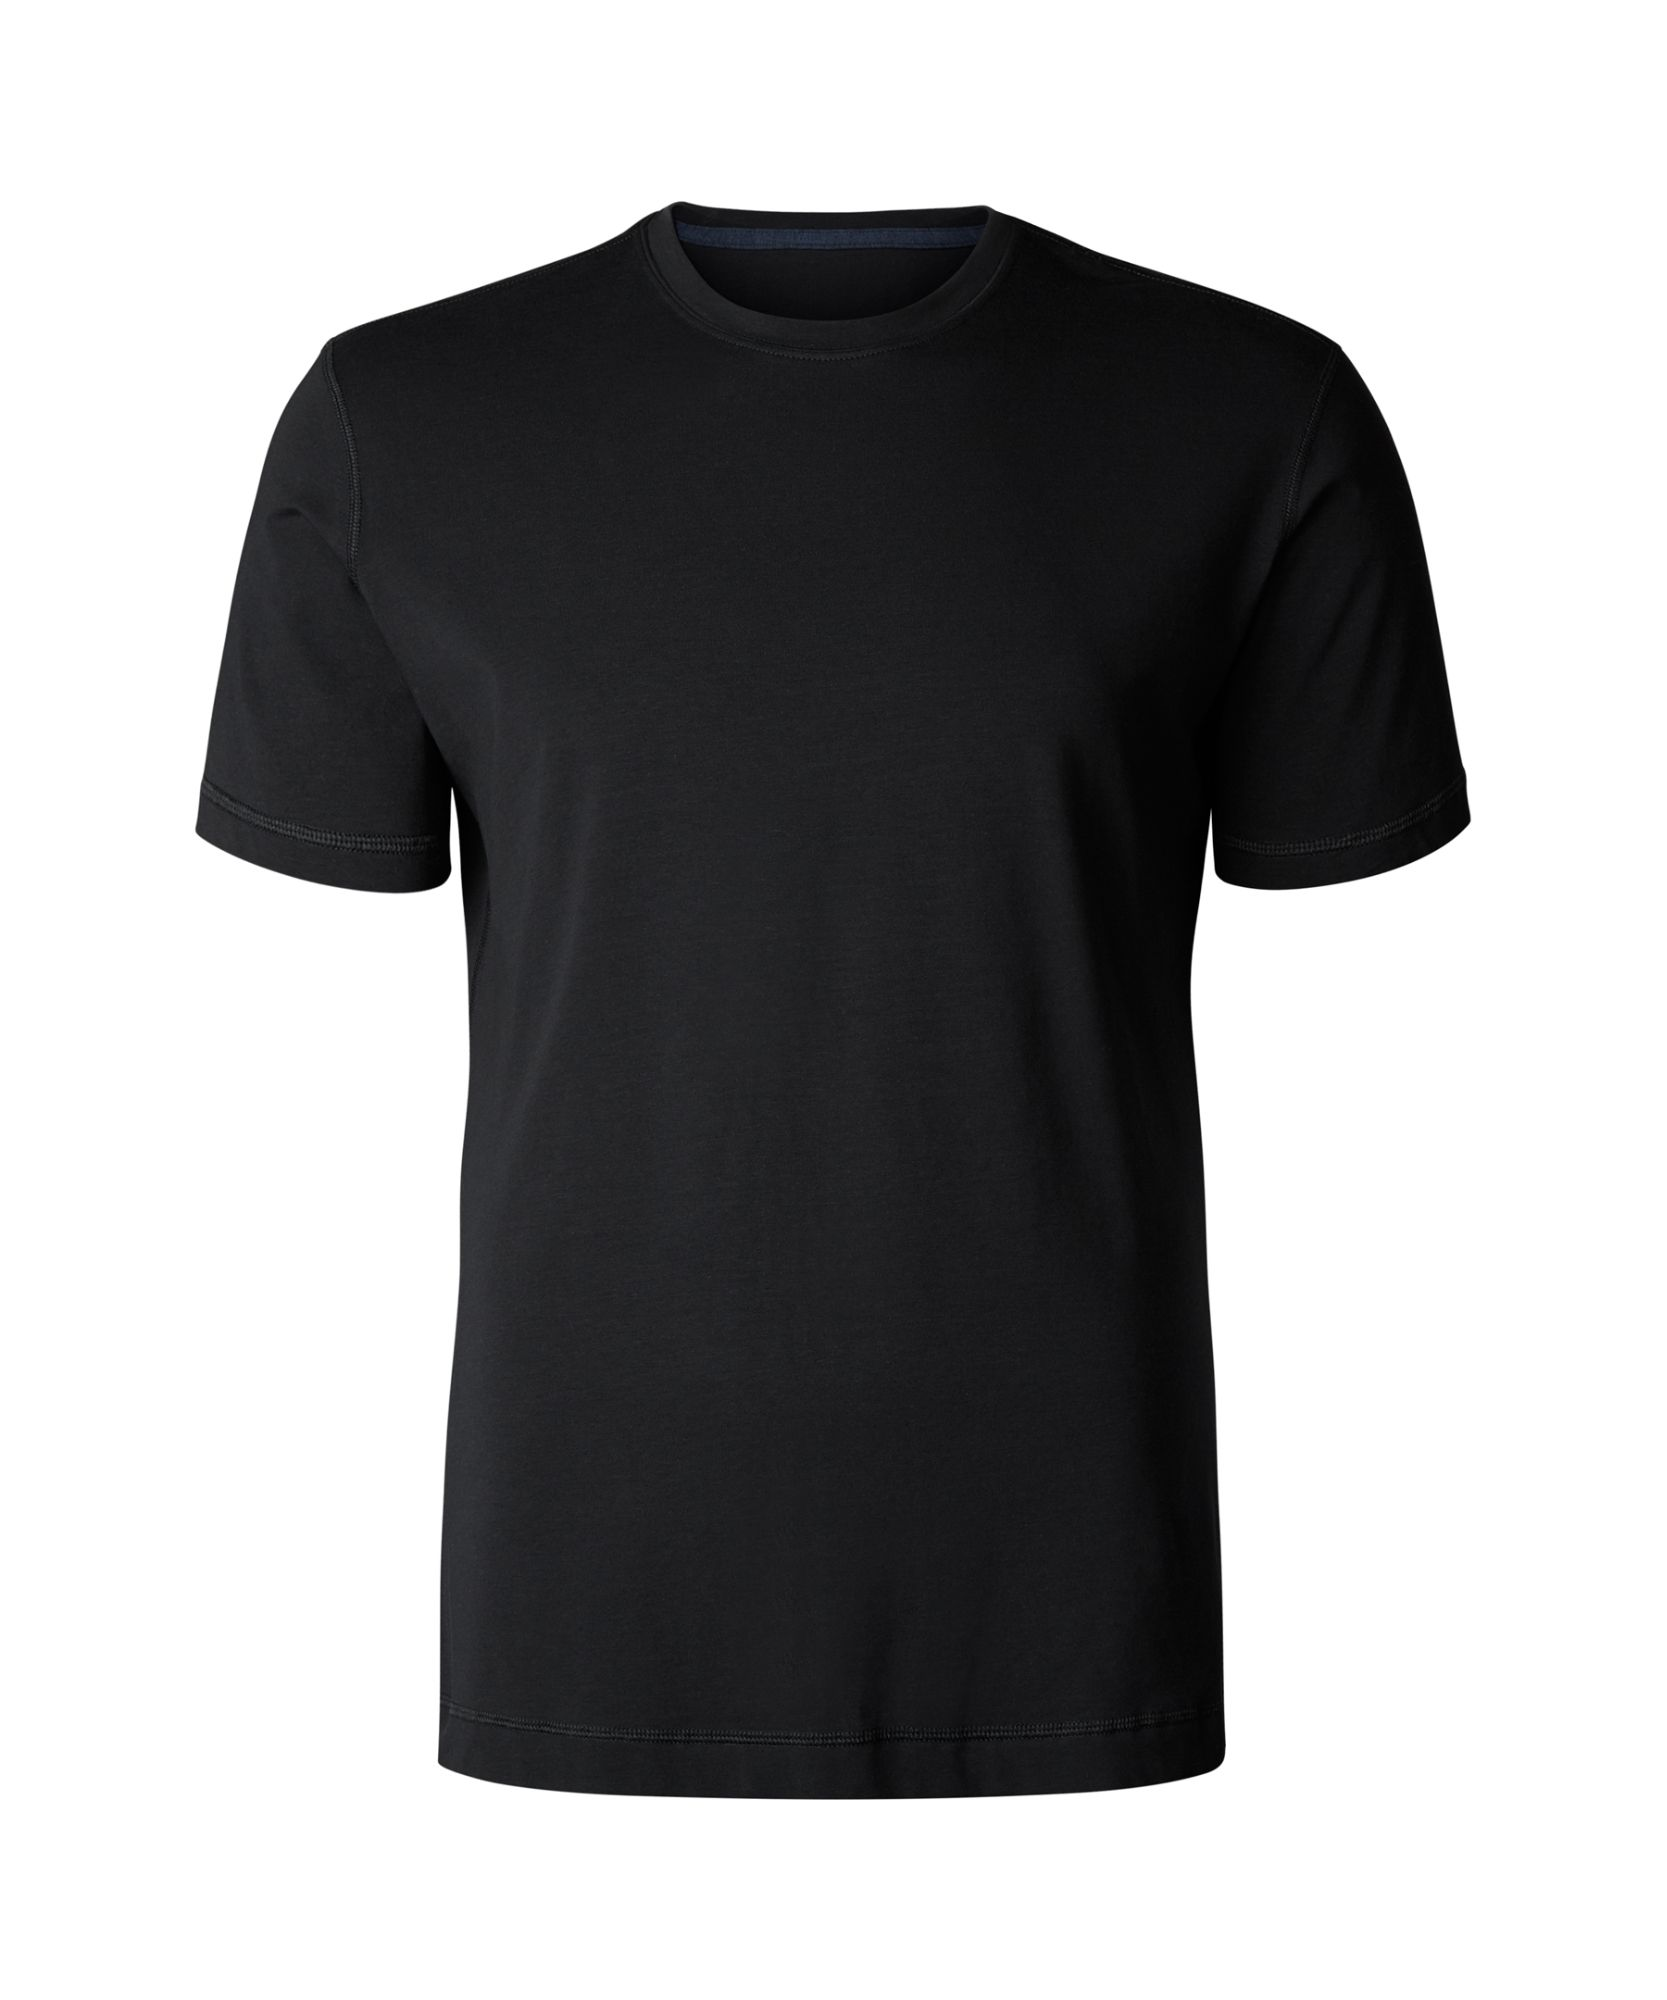 Download 5 Year Basic Tee Updated Fit Men S Short Sleeve Tops Lululemon T Shirt Png Printed Shirts Shirt Print Design